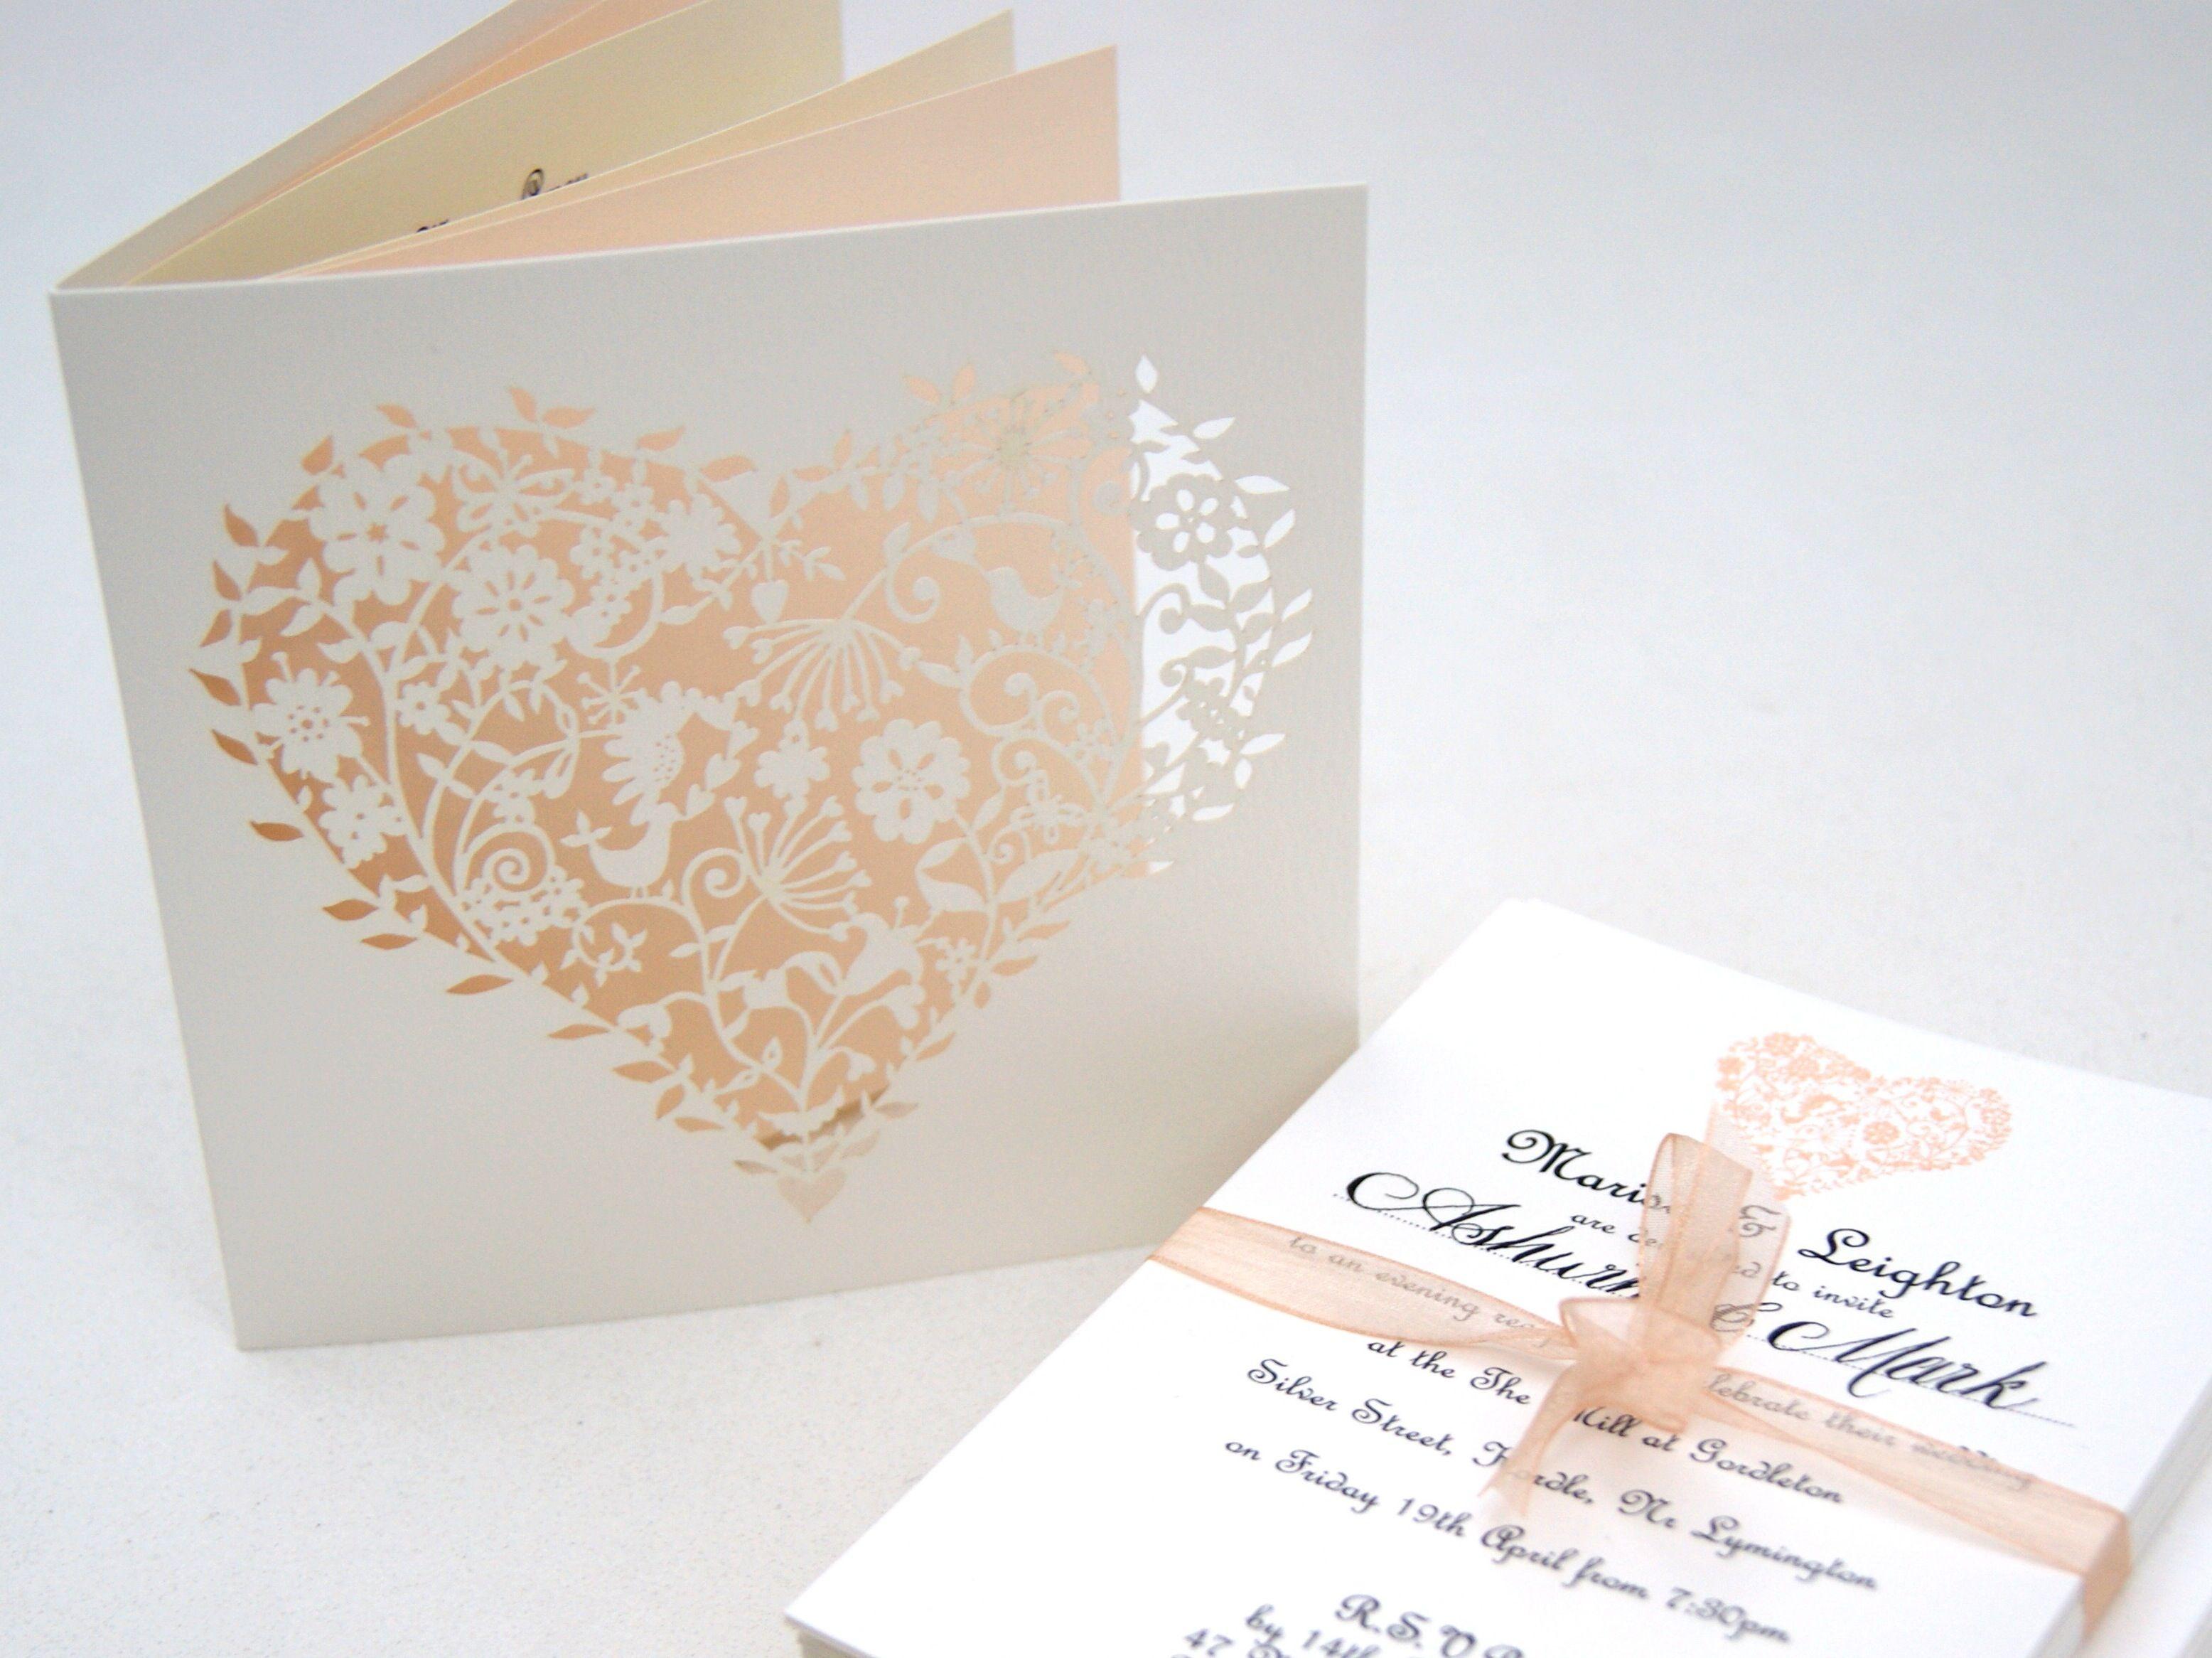 Cosmetic whimsical heart wedding invitations hummingbird card cosmetic whimsical heart wedding invitations monicamarmolfo Images